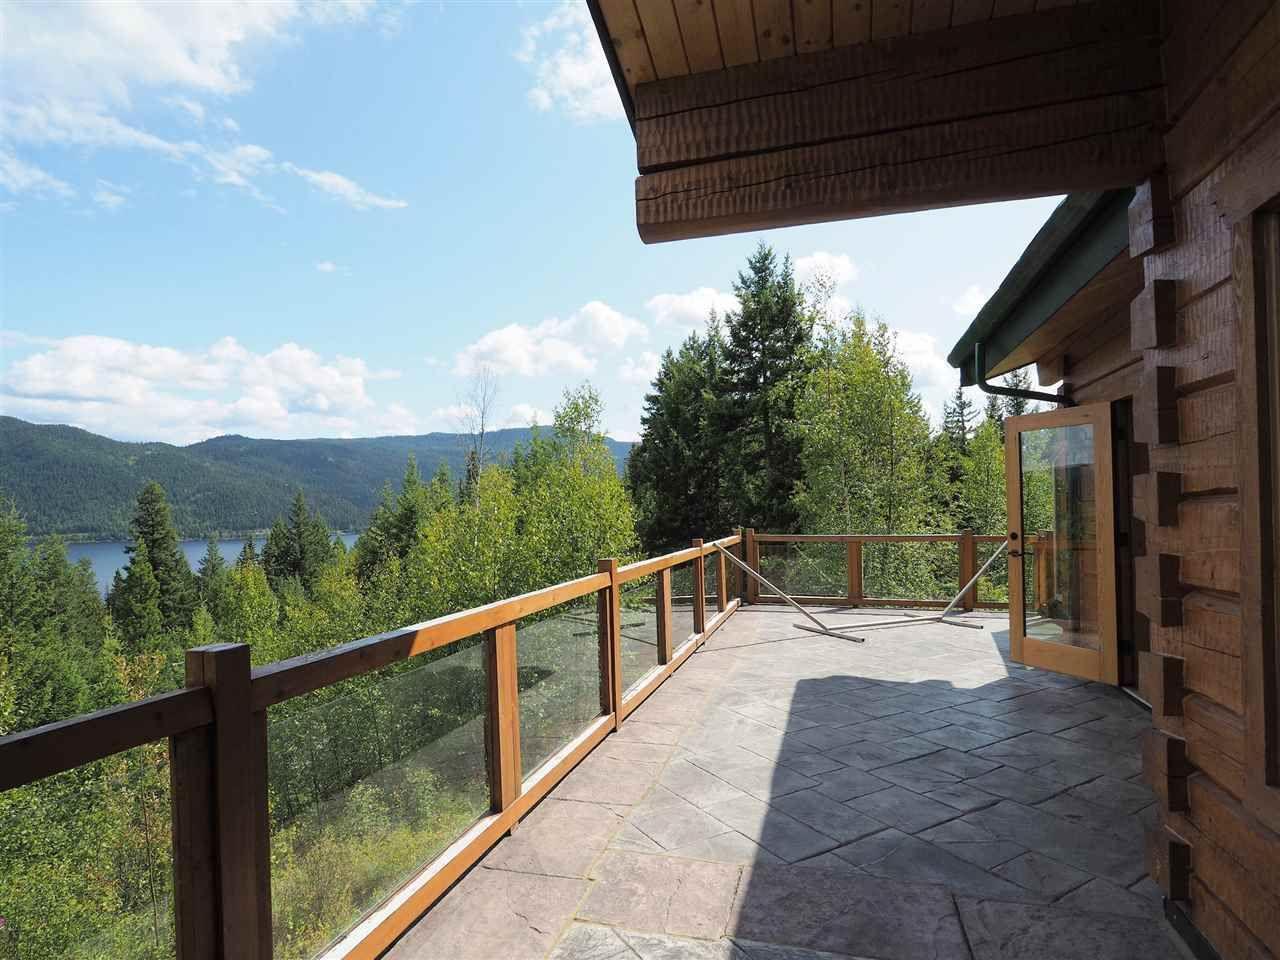 Photo 17: Photos: 4050 CANIM-HENDRIX LAKE Road in Canim Lake: Canim/Mahood Lake House for sale (100 Mile House (Zone 10))  : MLS®# R2396282